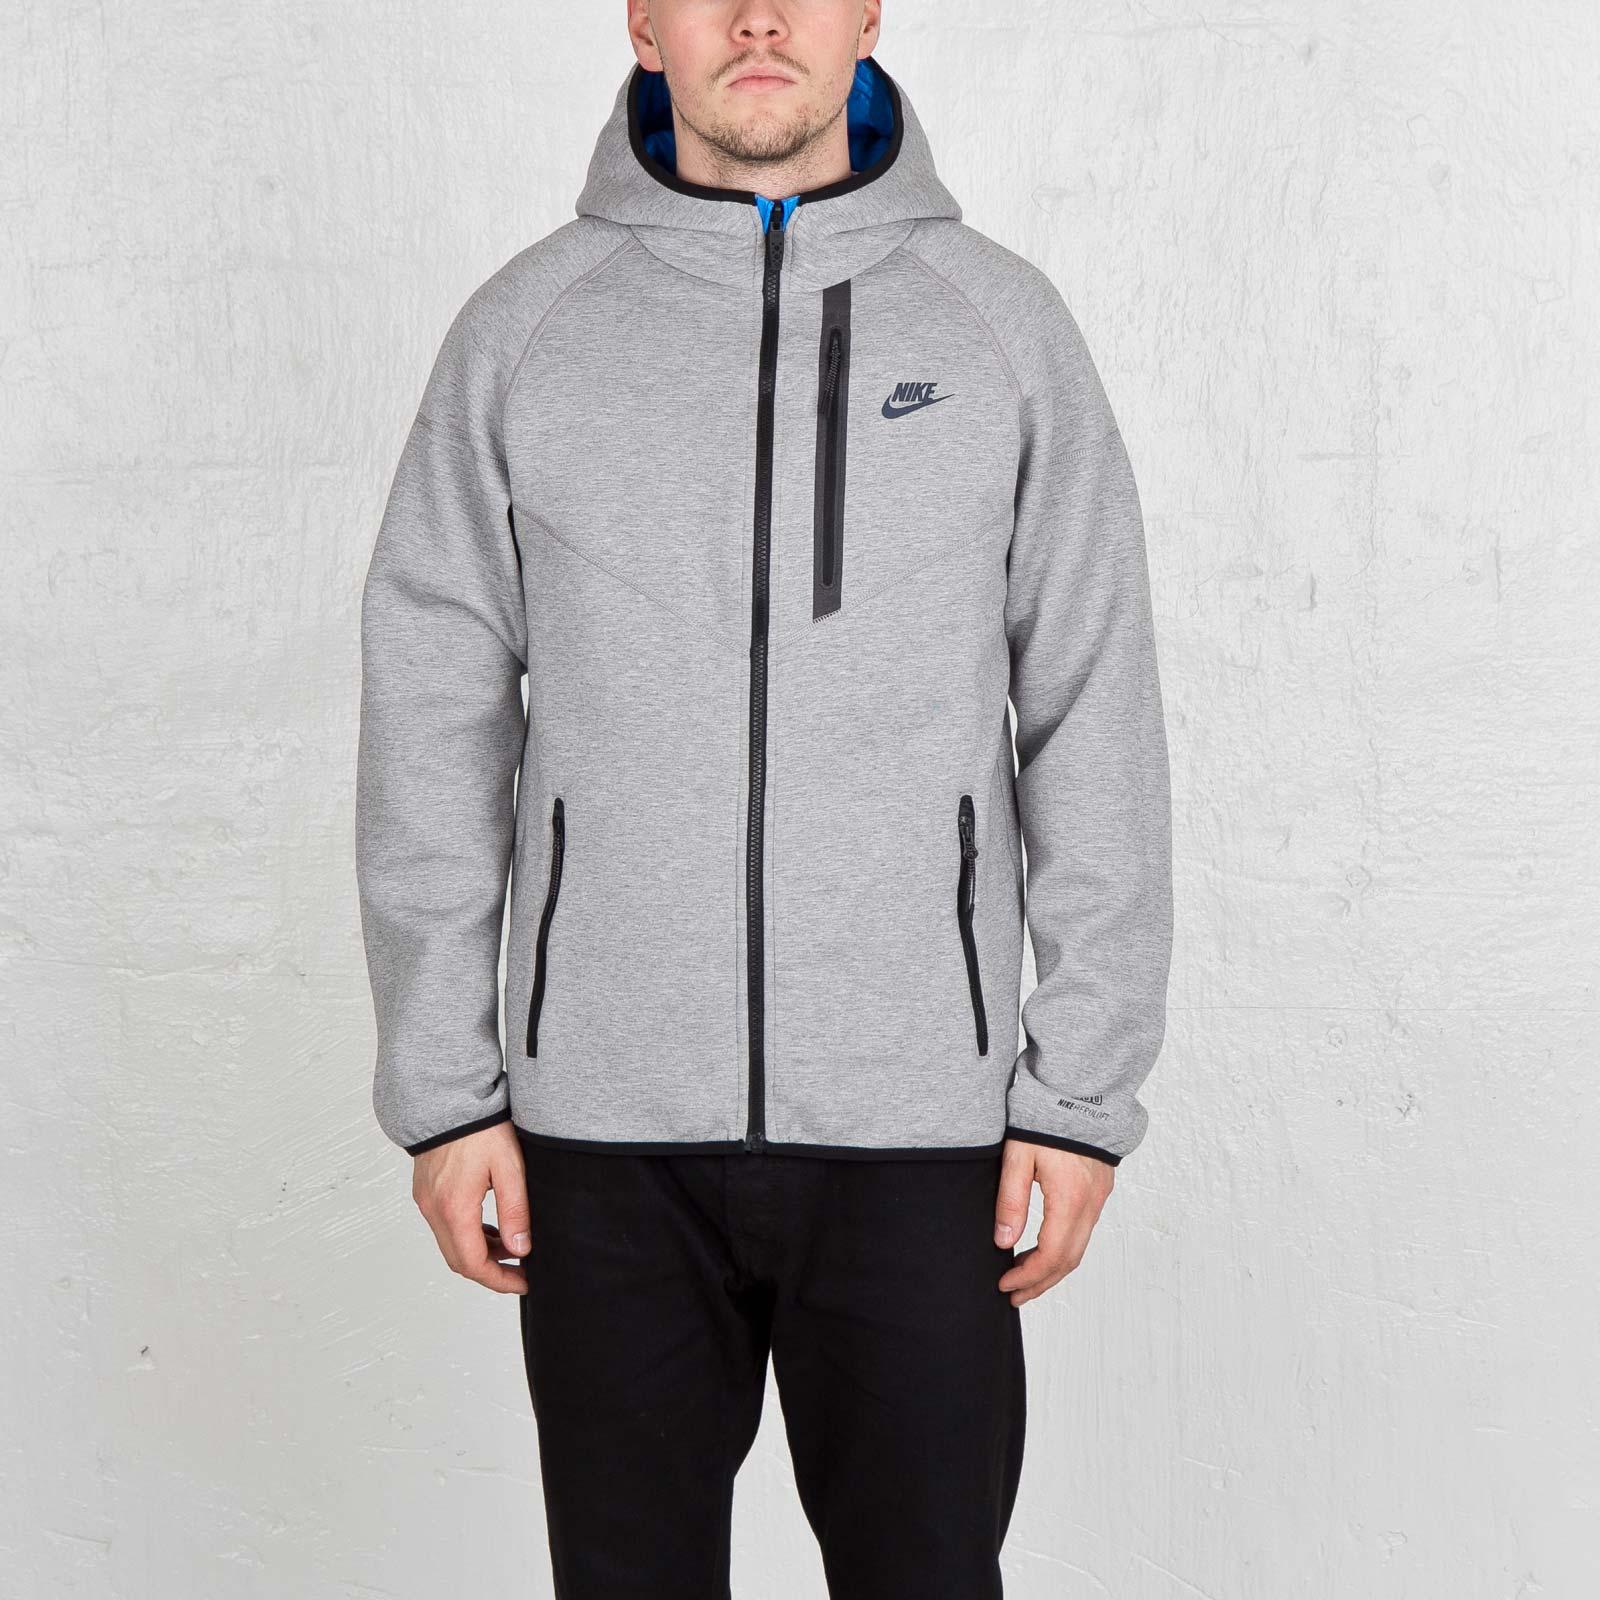 Nike Tech Men's Fleece Aeroloft Windrunner 614665 063 Blue Grey